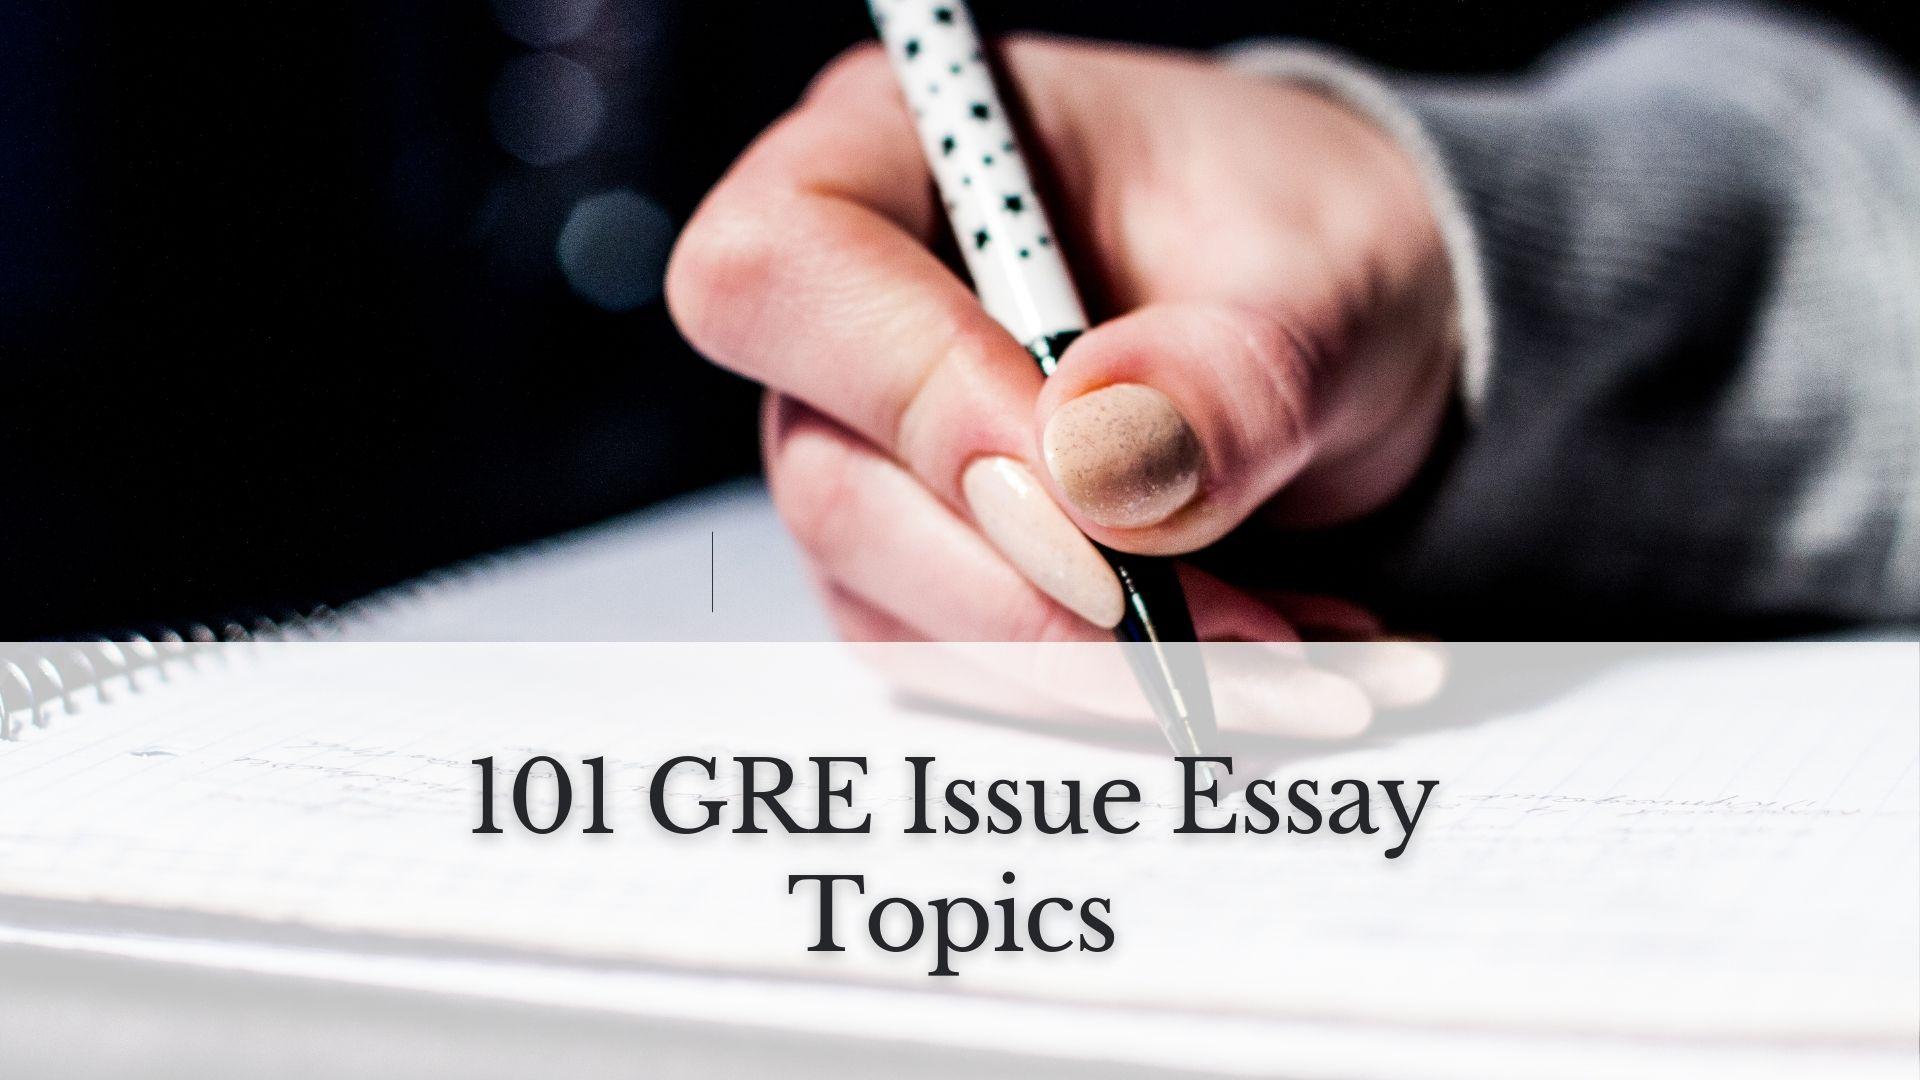 GRE Issue Essay Topics